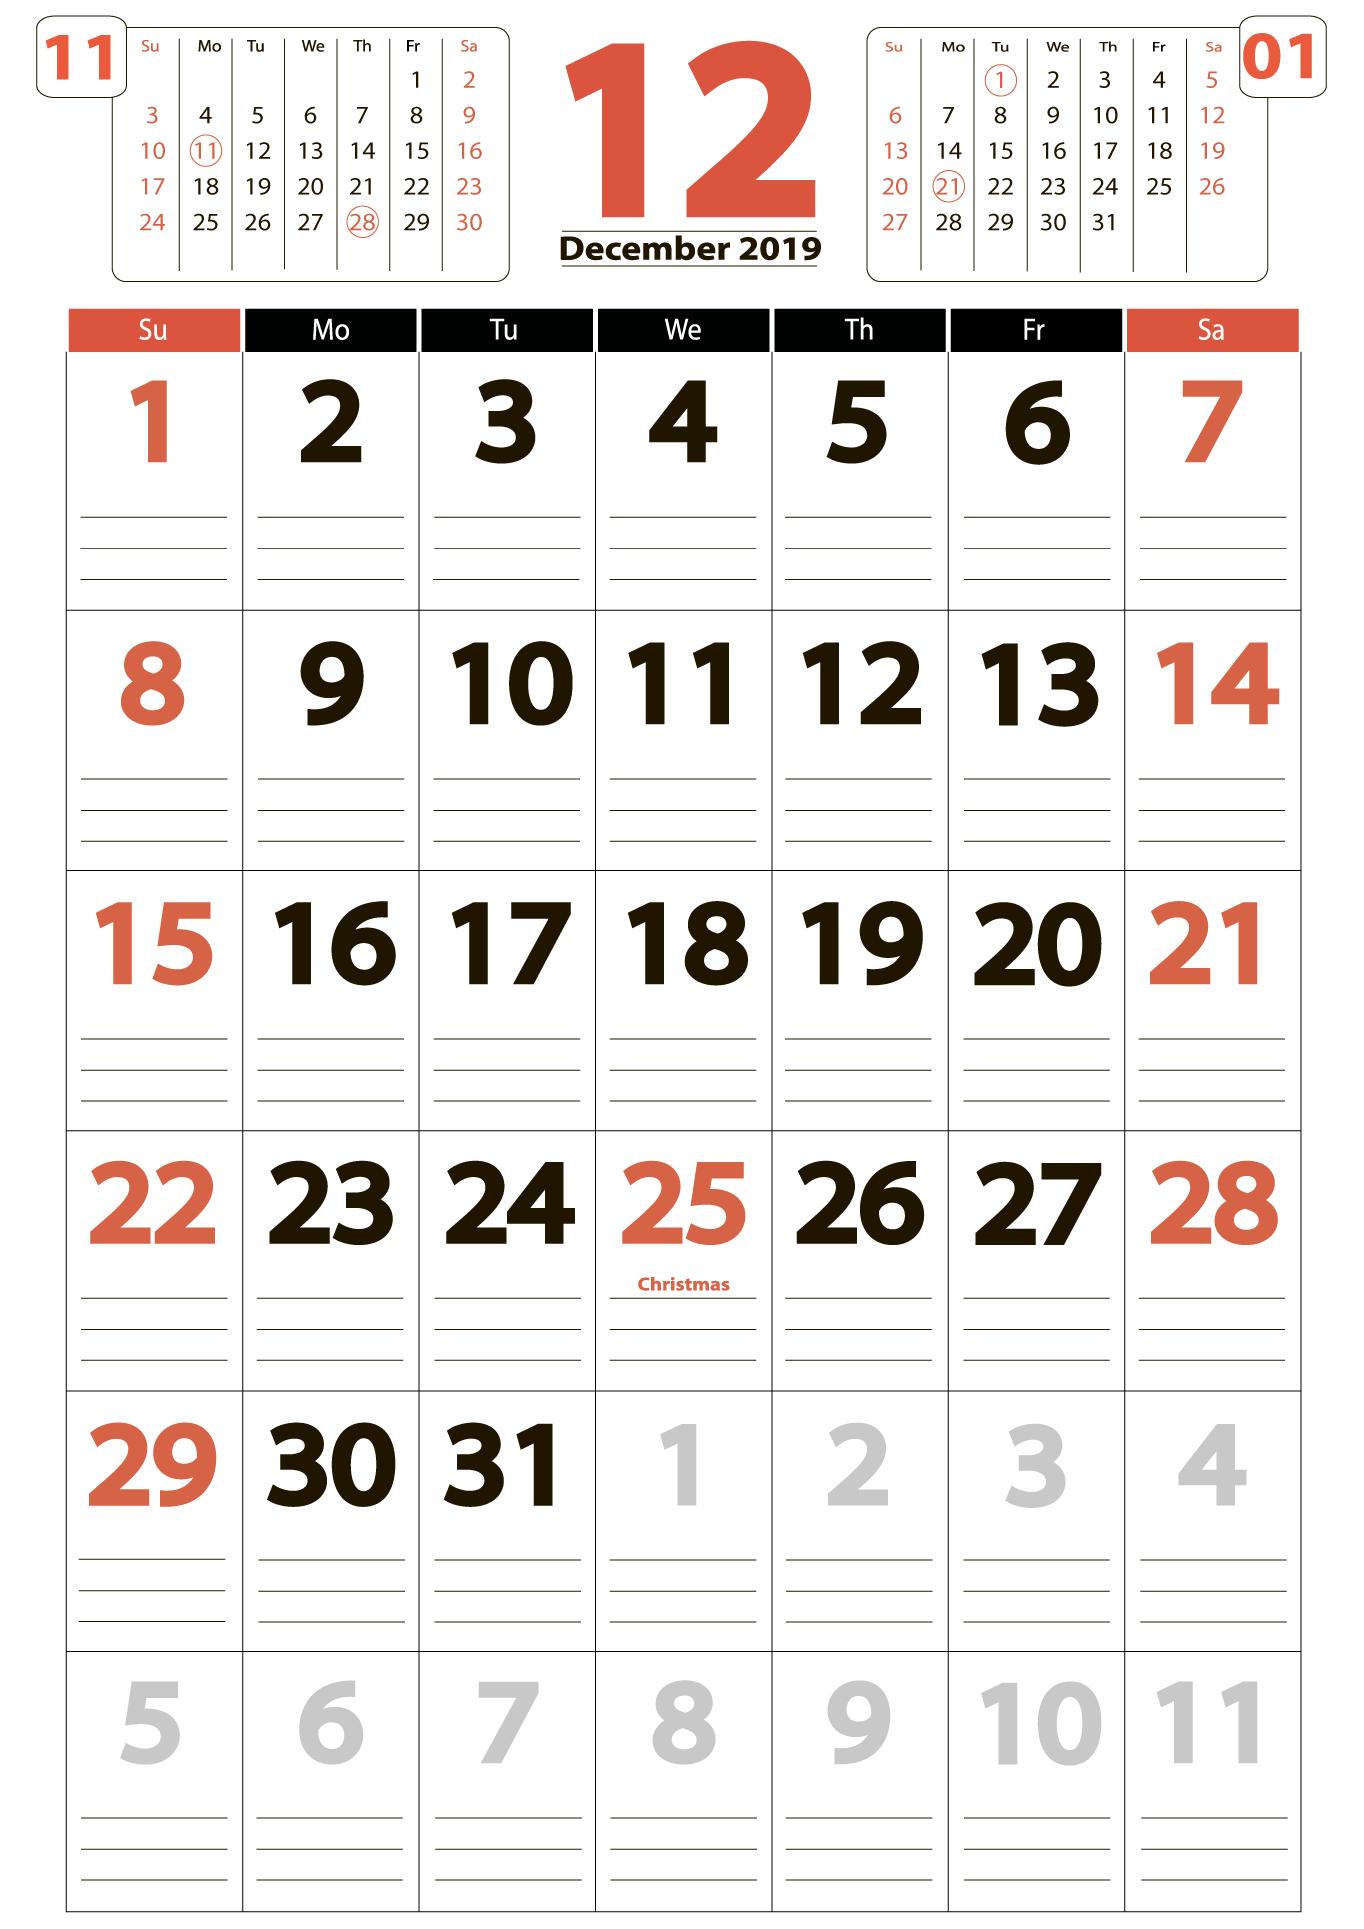 December 2019 big calendar